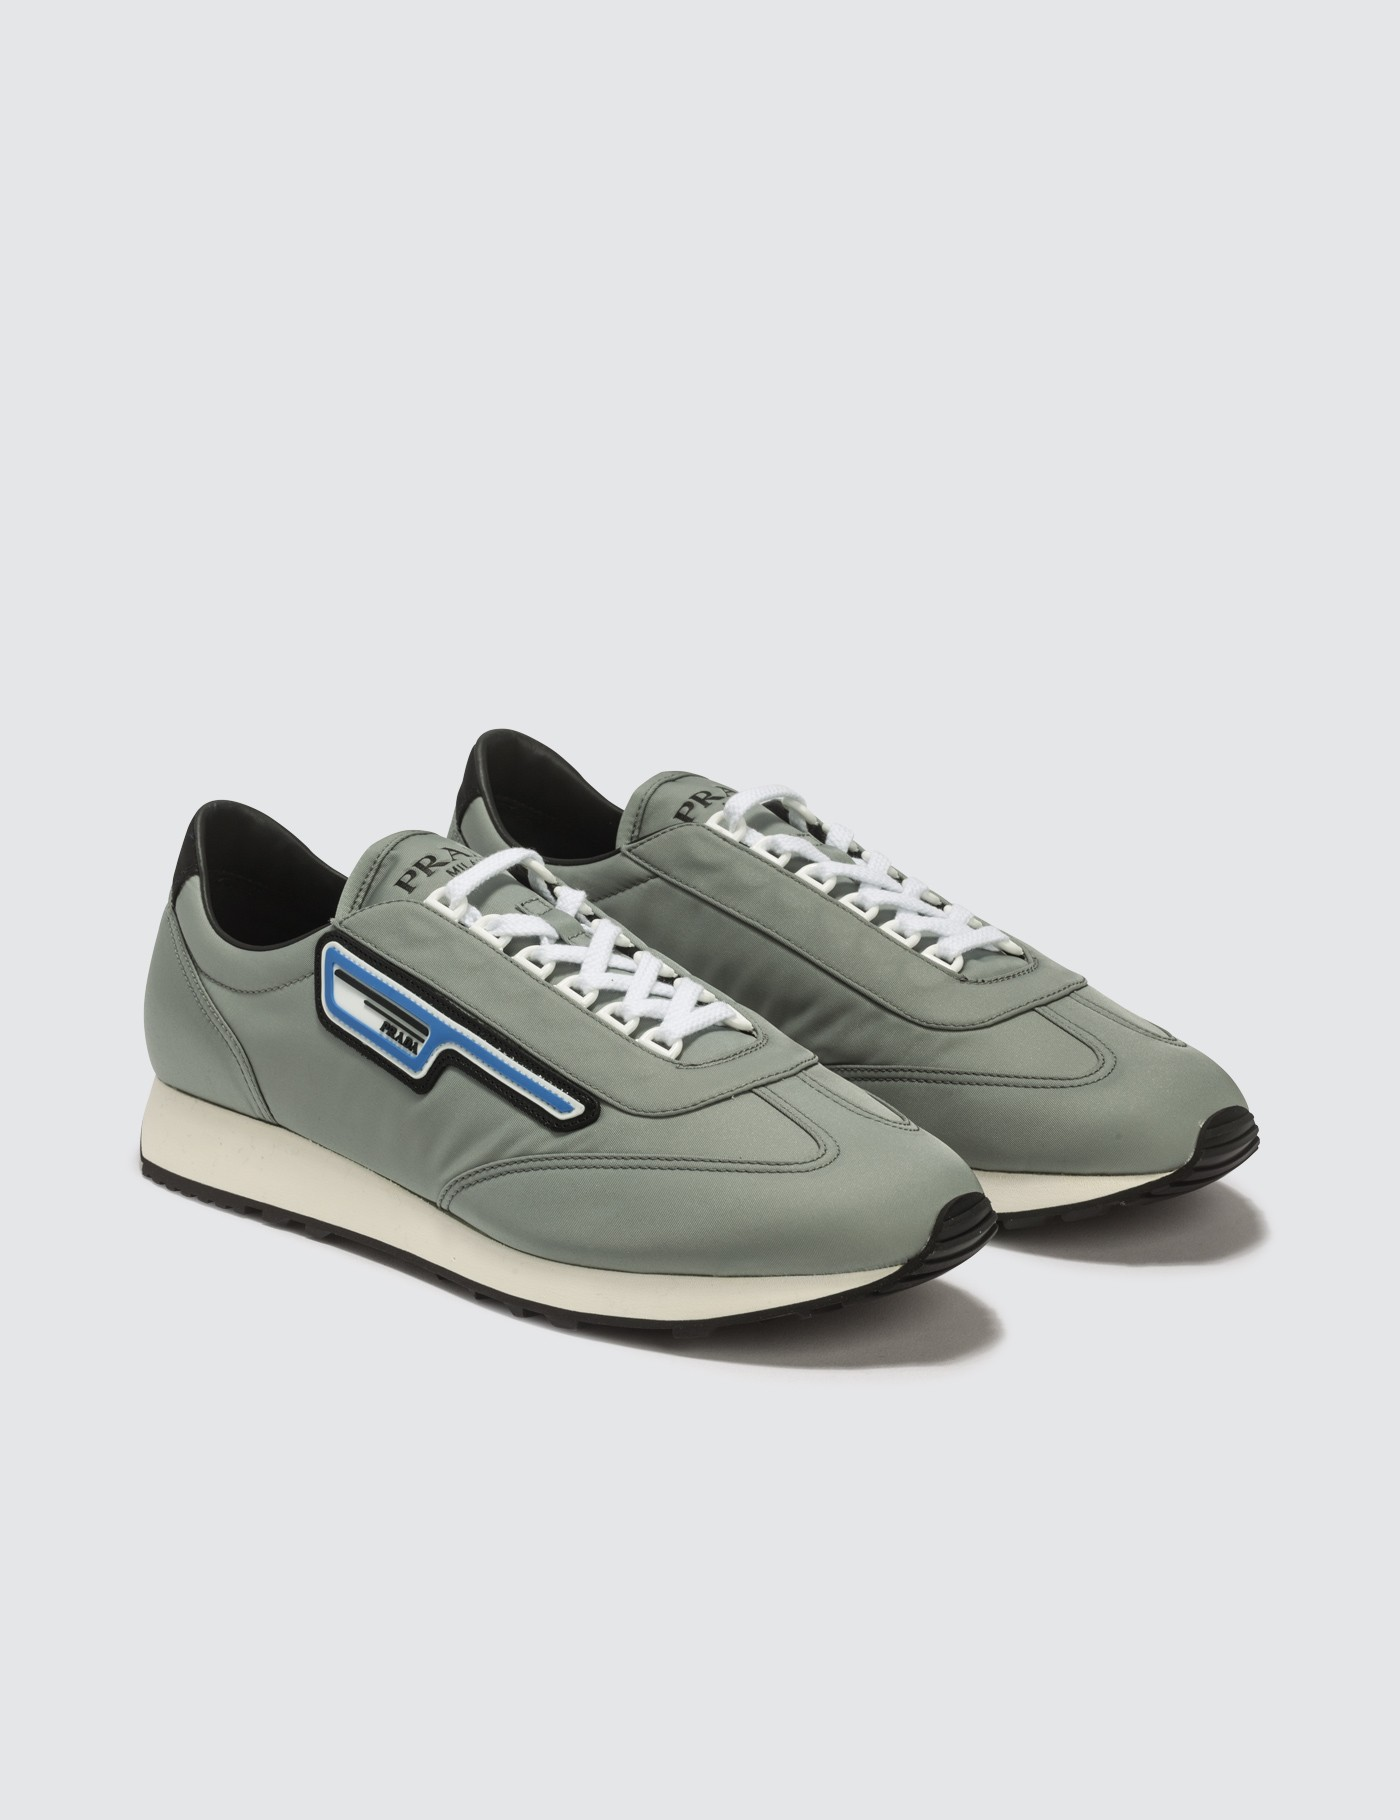 Prada - Nylon Gabardine Sneaker   HBX